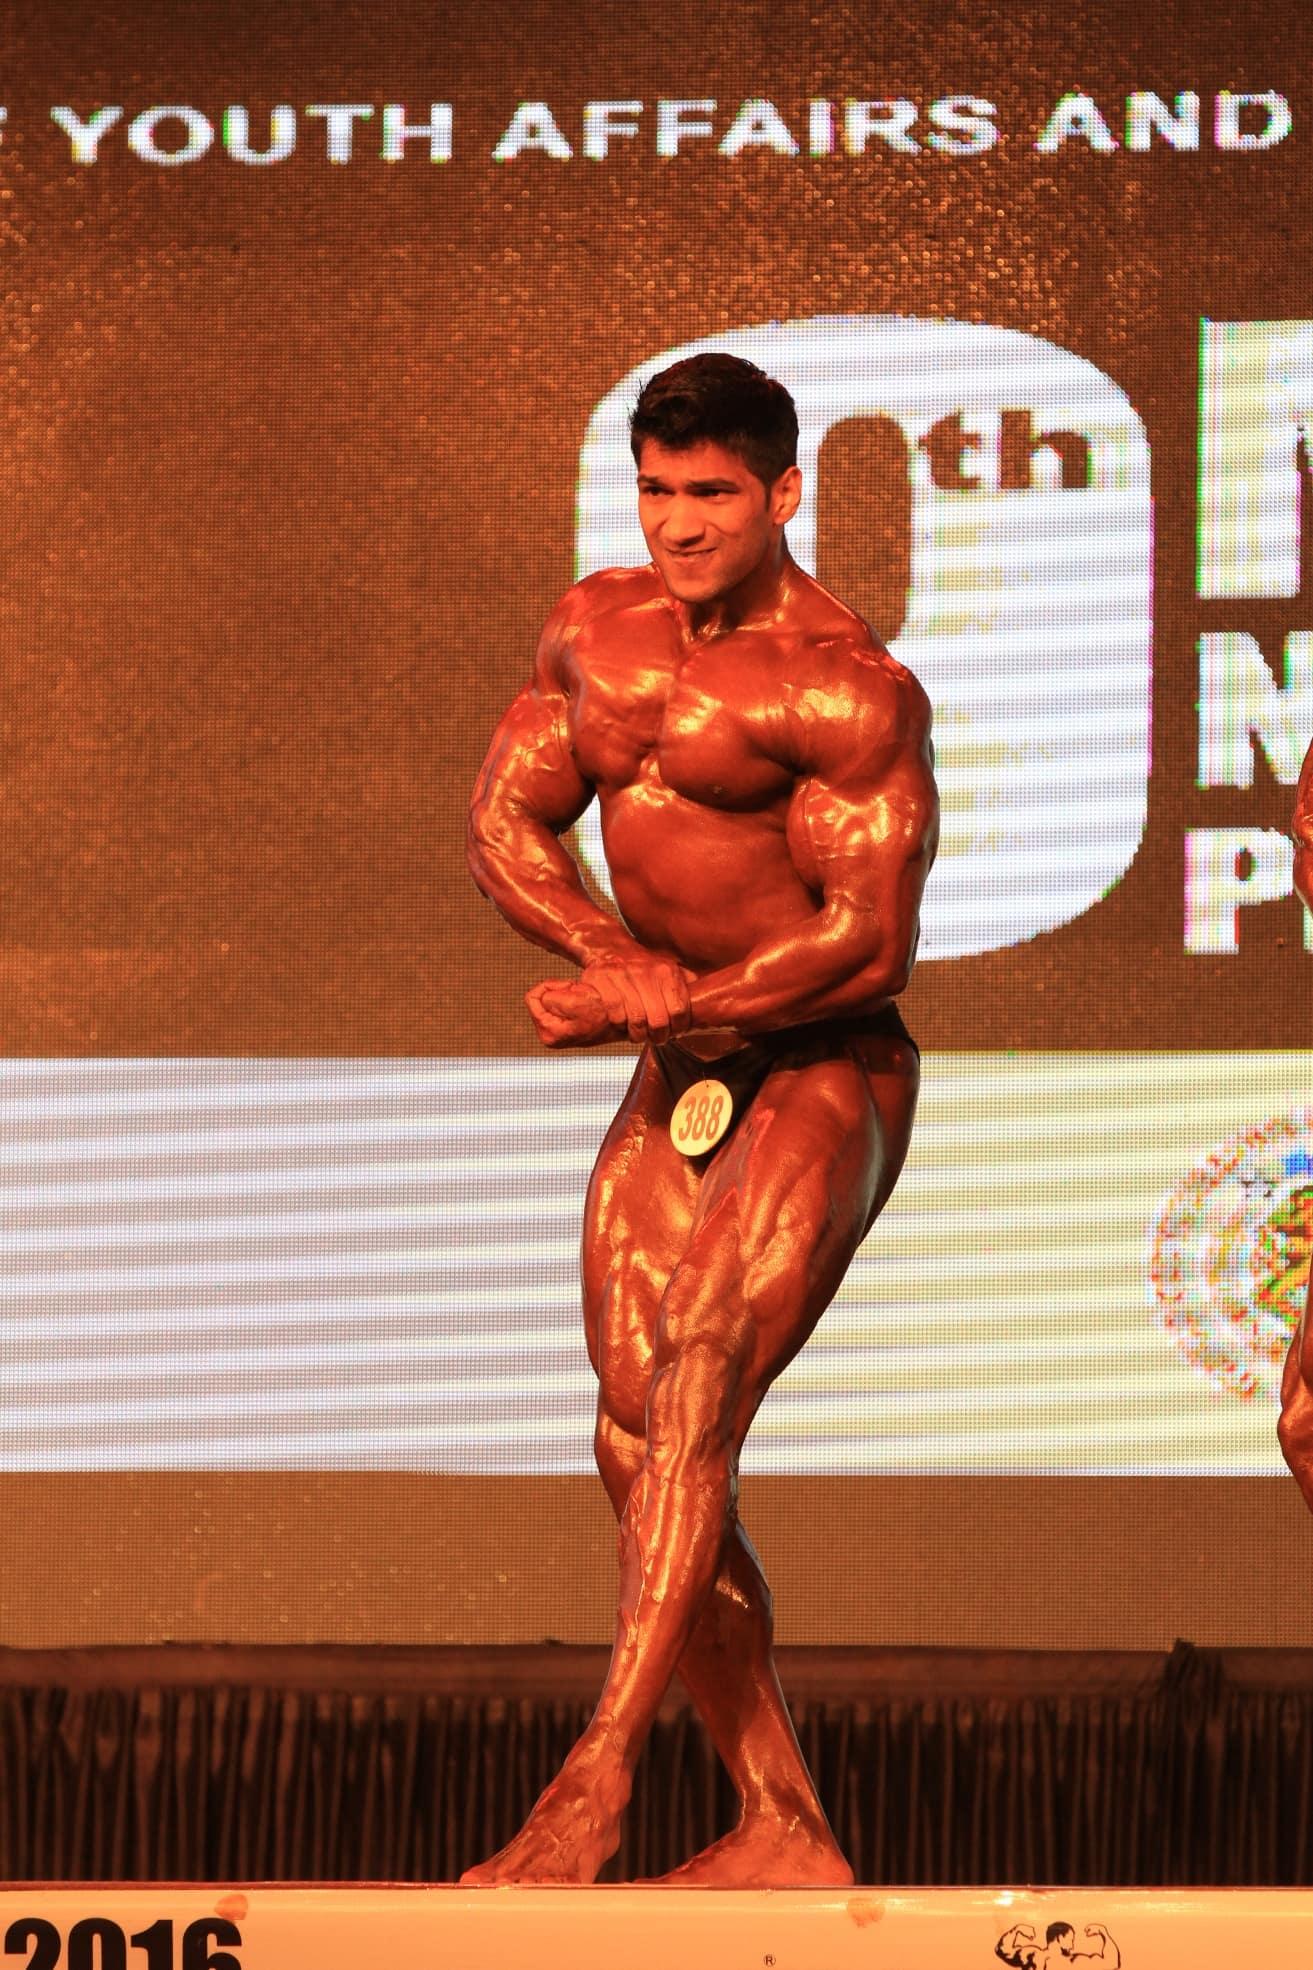 Sagar kate at bodybuilding event 2